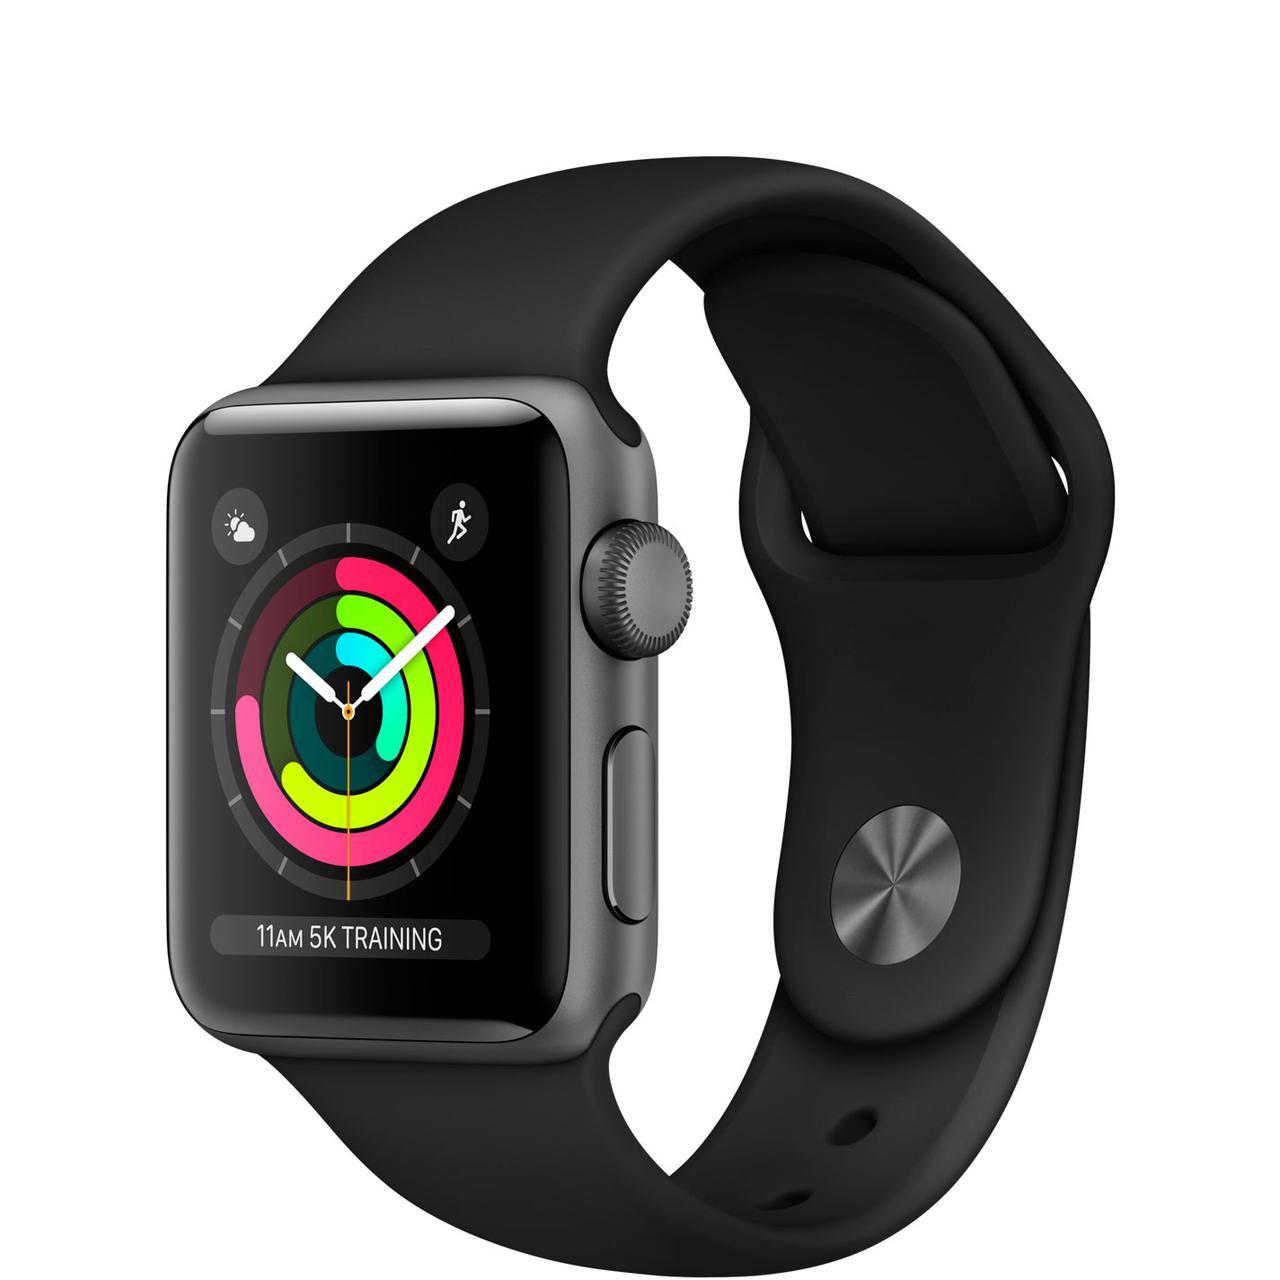 Apple Watch Series 3 GPS 38 мм Grey Aluminium Case with Black Band (MQKV2)